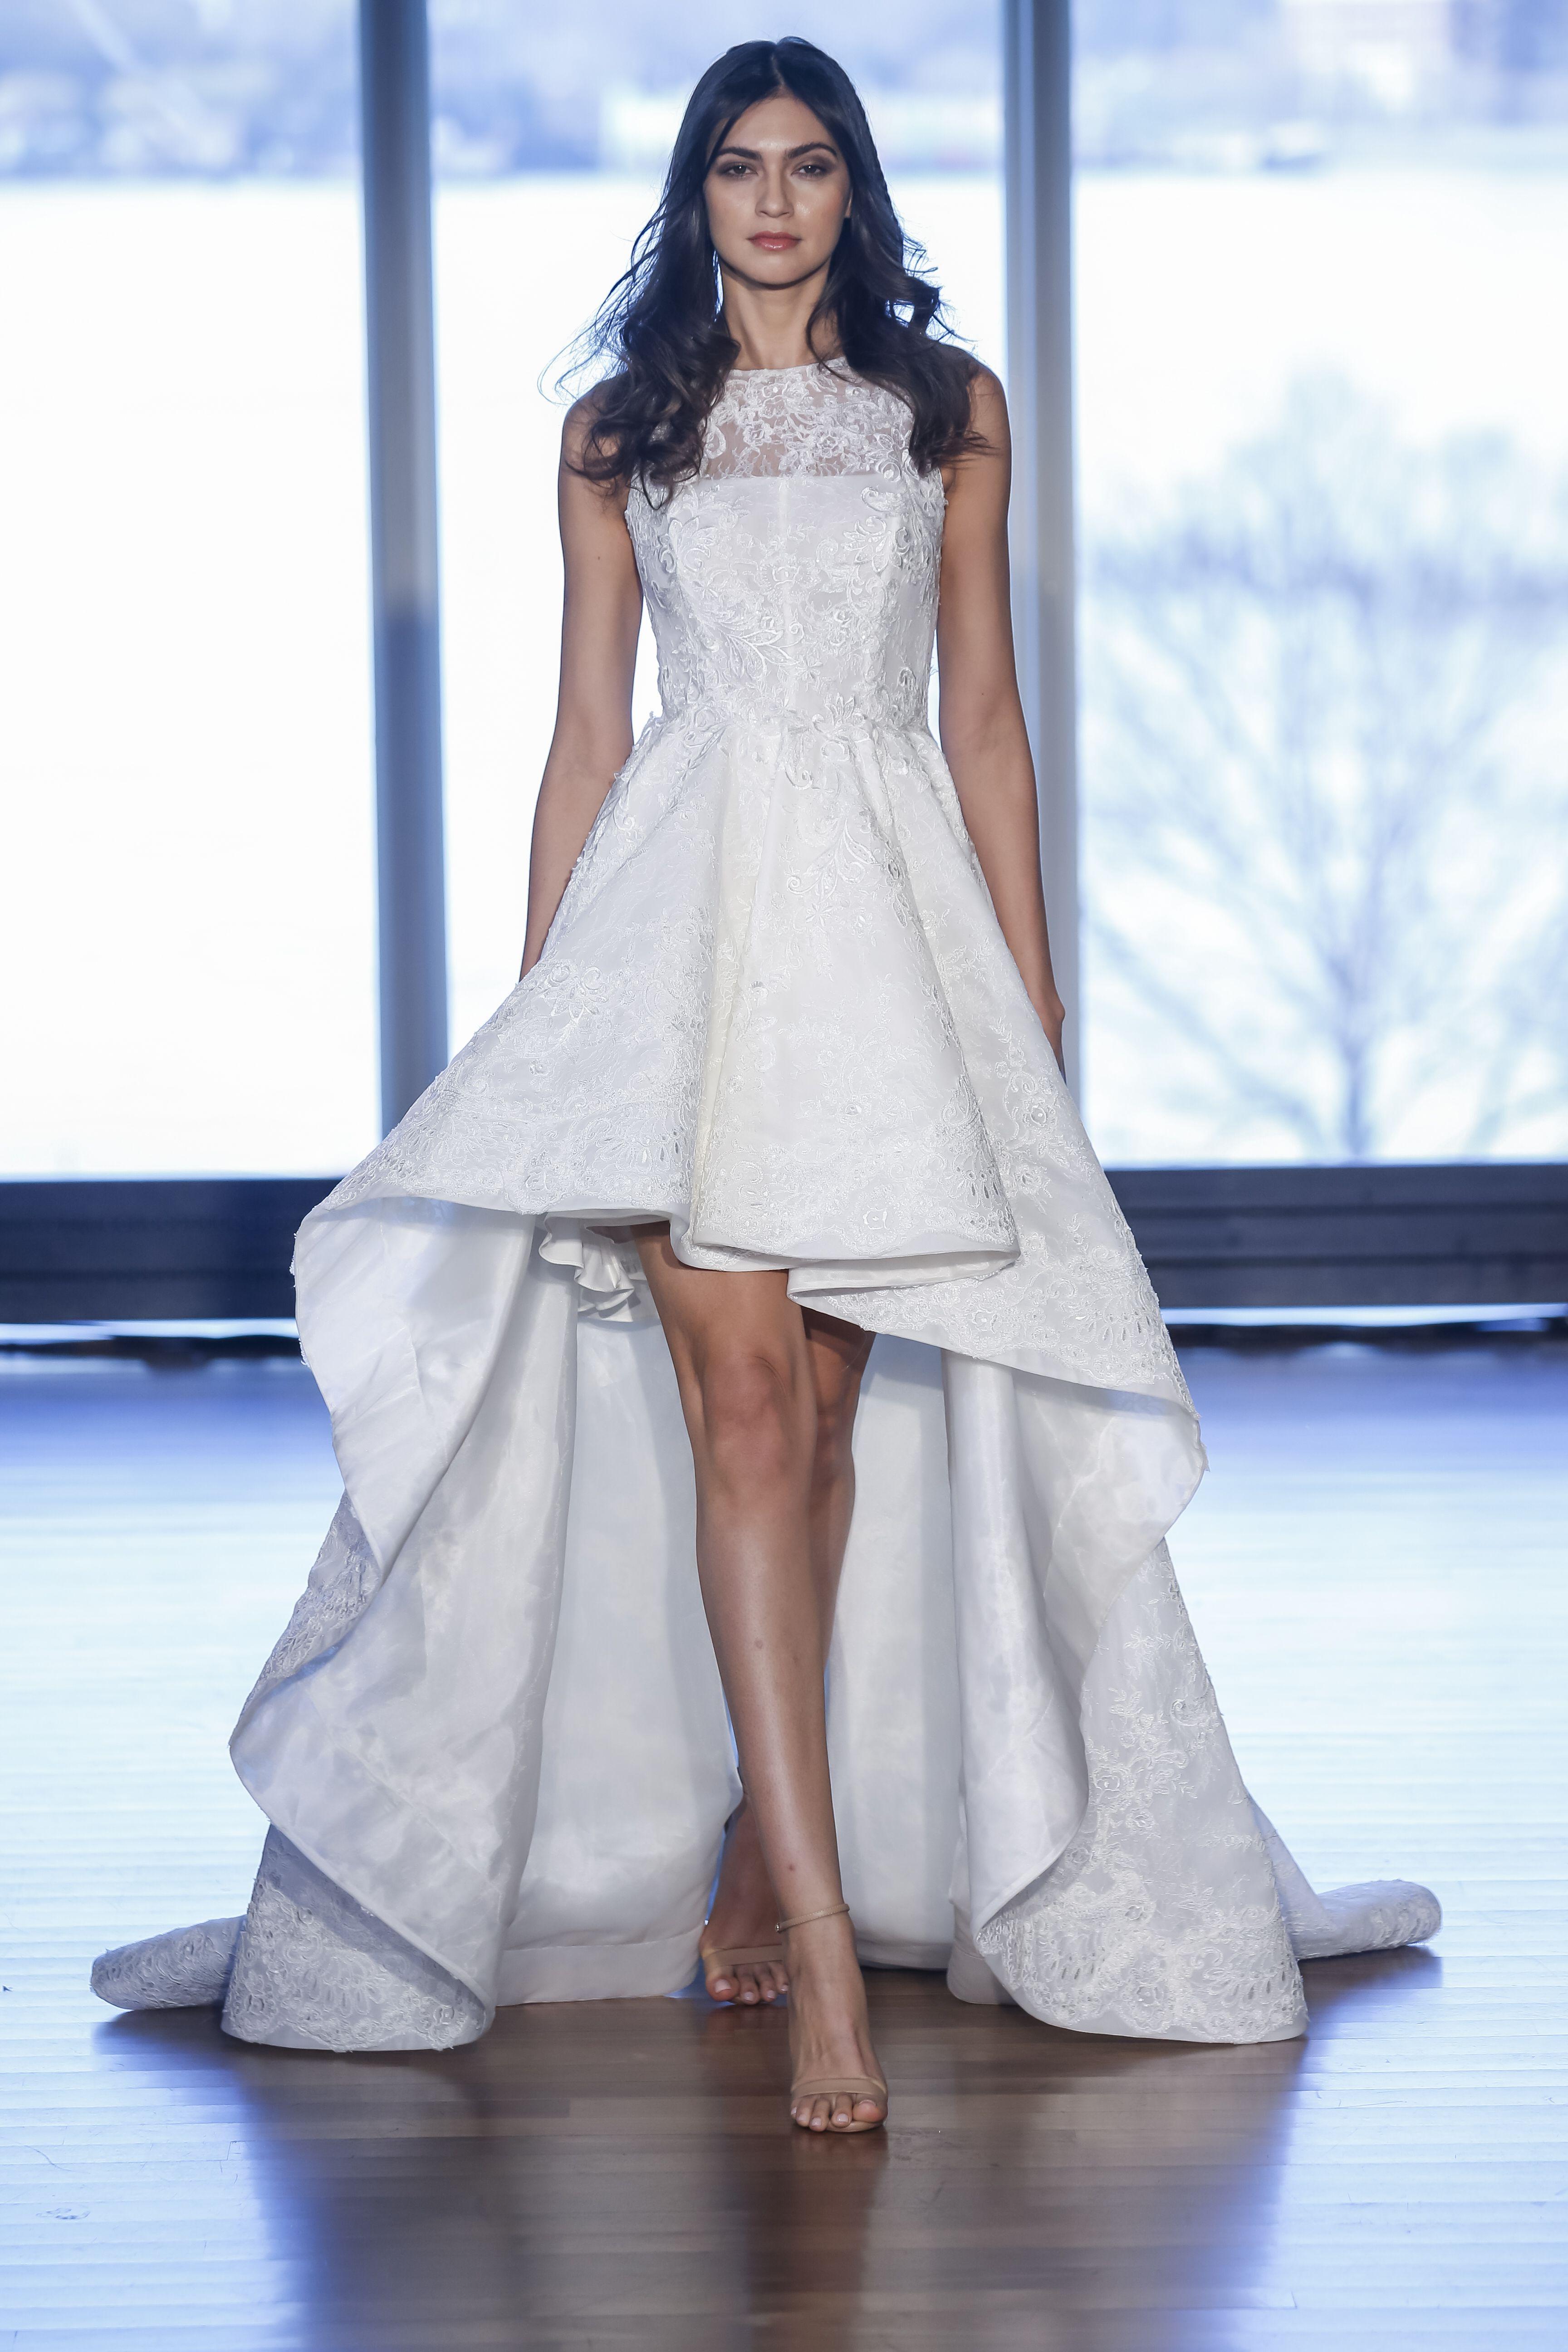 15+ Wedding dress tailor chicago information